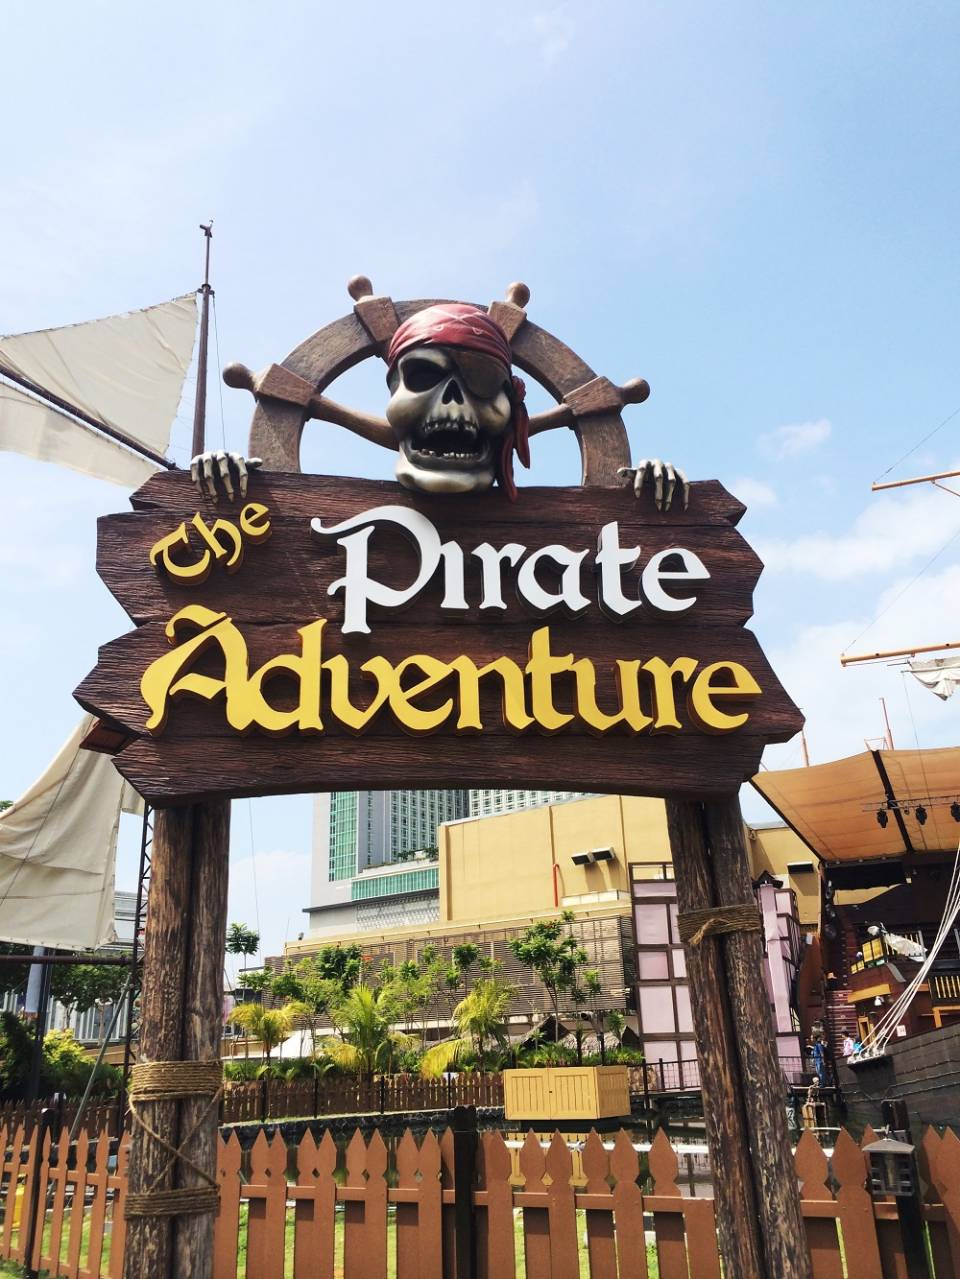 ���������ȫ�¾��� Pirate Adventure Land�����ˣ�